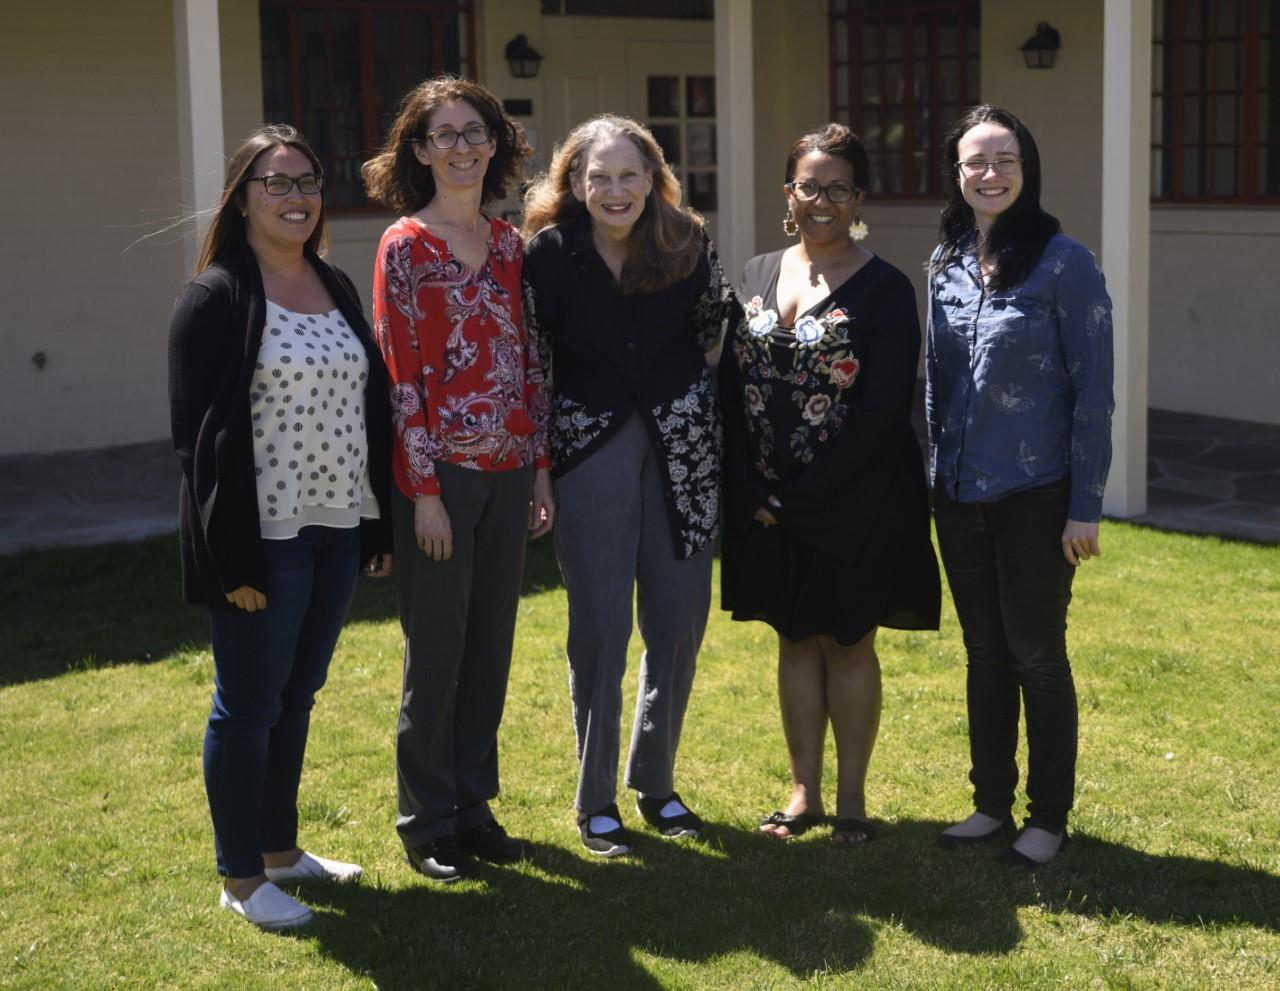 Federally Employed Women's officers include (L to R): Deanna Morell, Shana Tighi (Secretary,) Valerie Weisser (Treasurer), Yvette Scott-Butler (Former President) and Genevieve Allan (Current President).